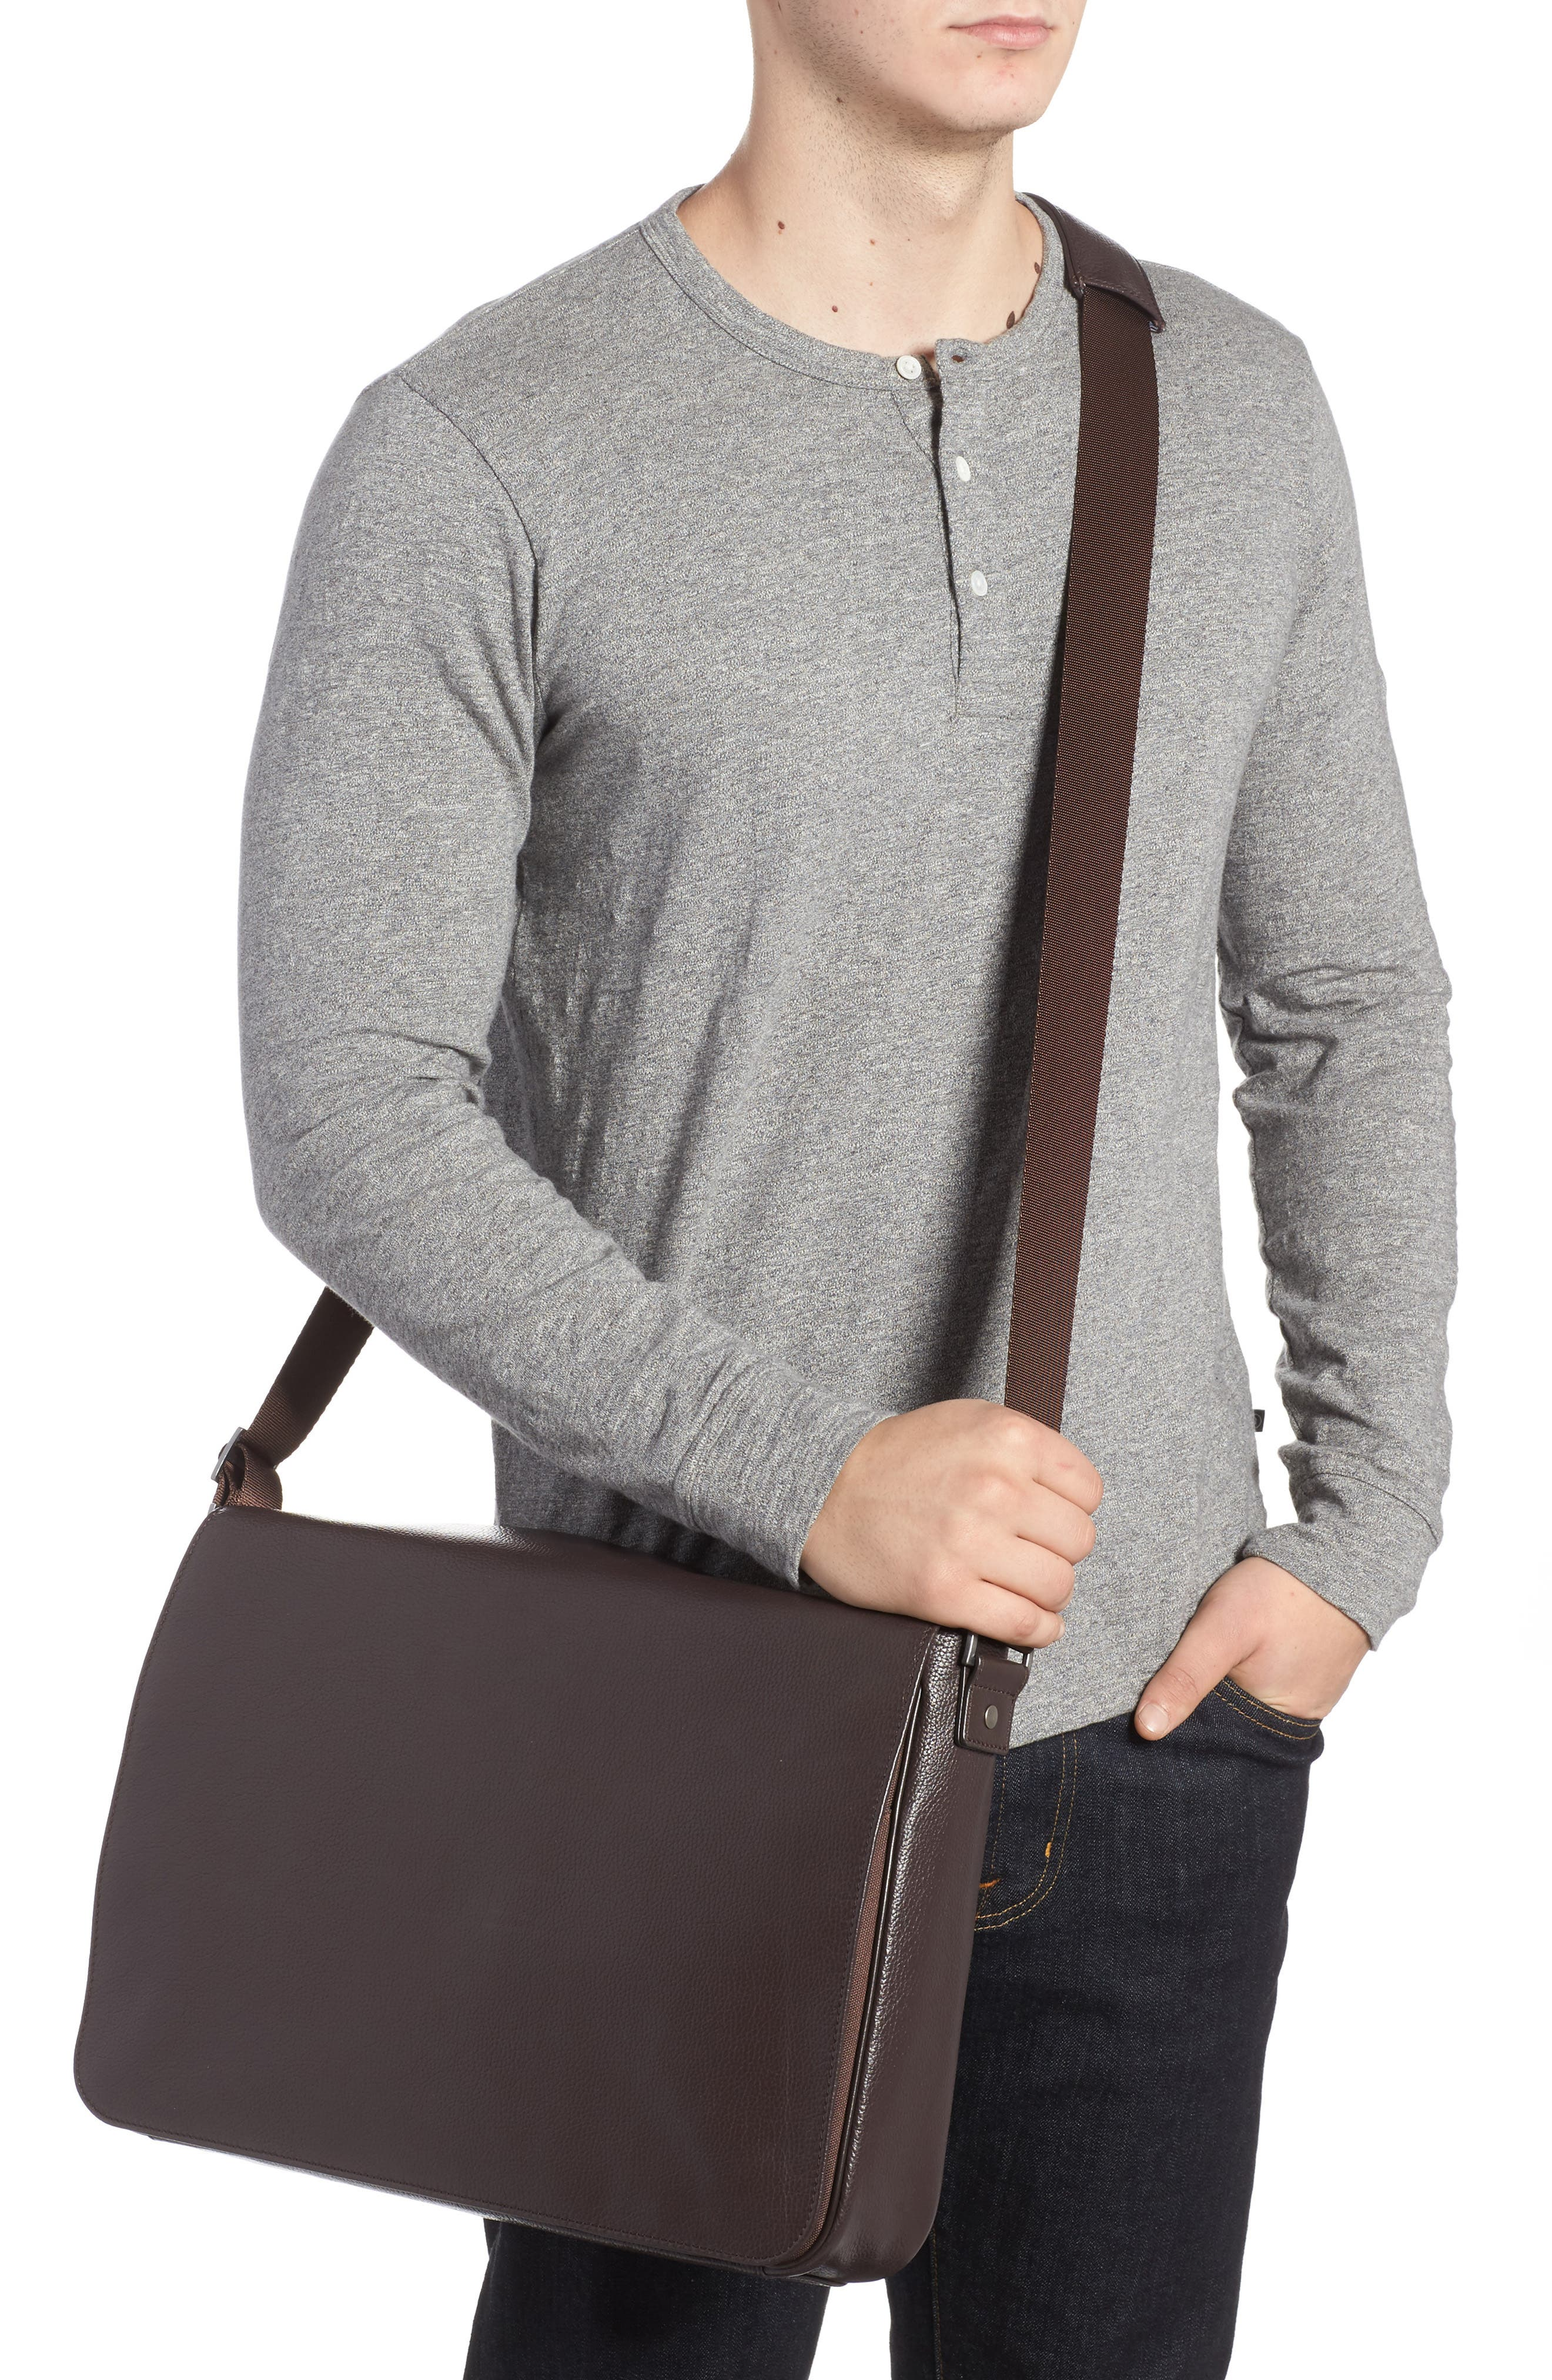 Midland Leather Messenger Bag,                             Alternate thumbnail 2, color,                             Brown